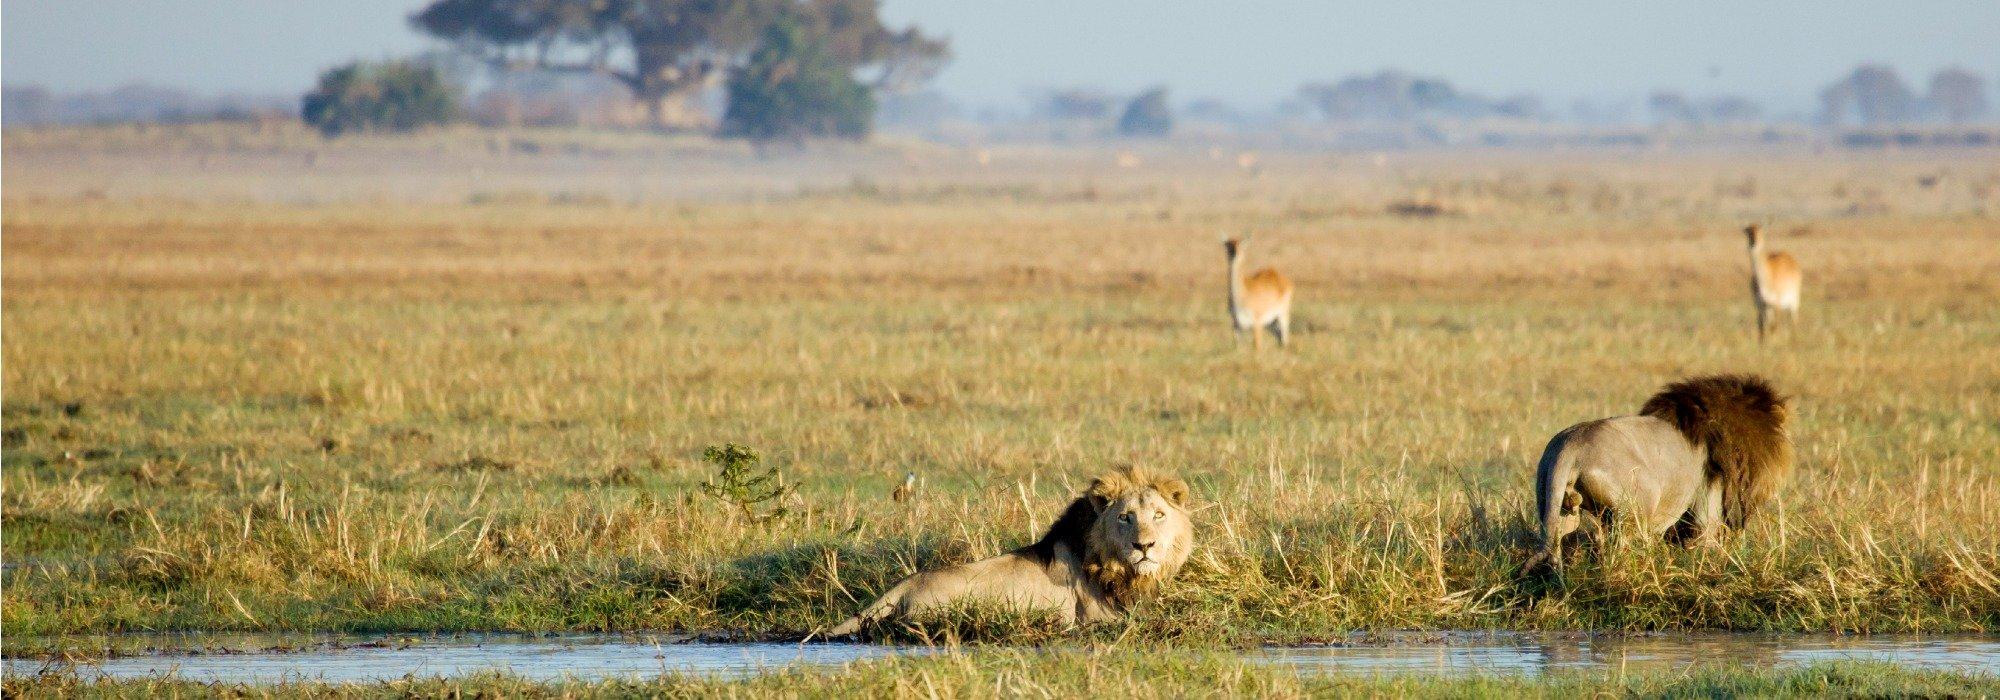 Busanga Swamp Lions